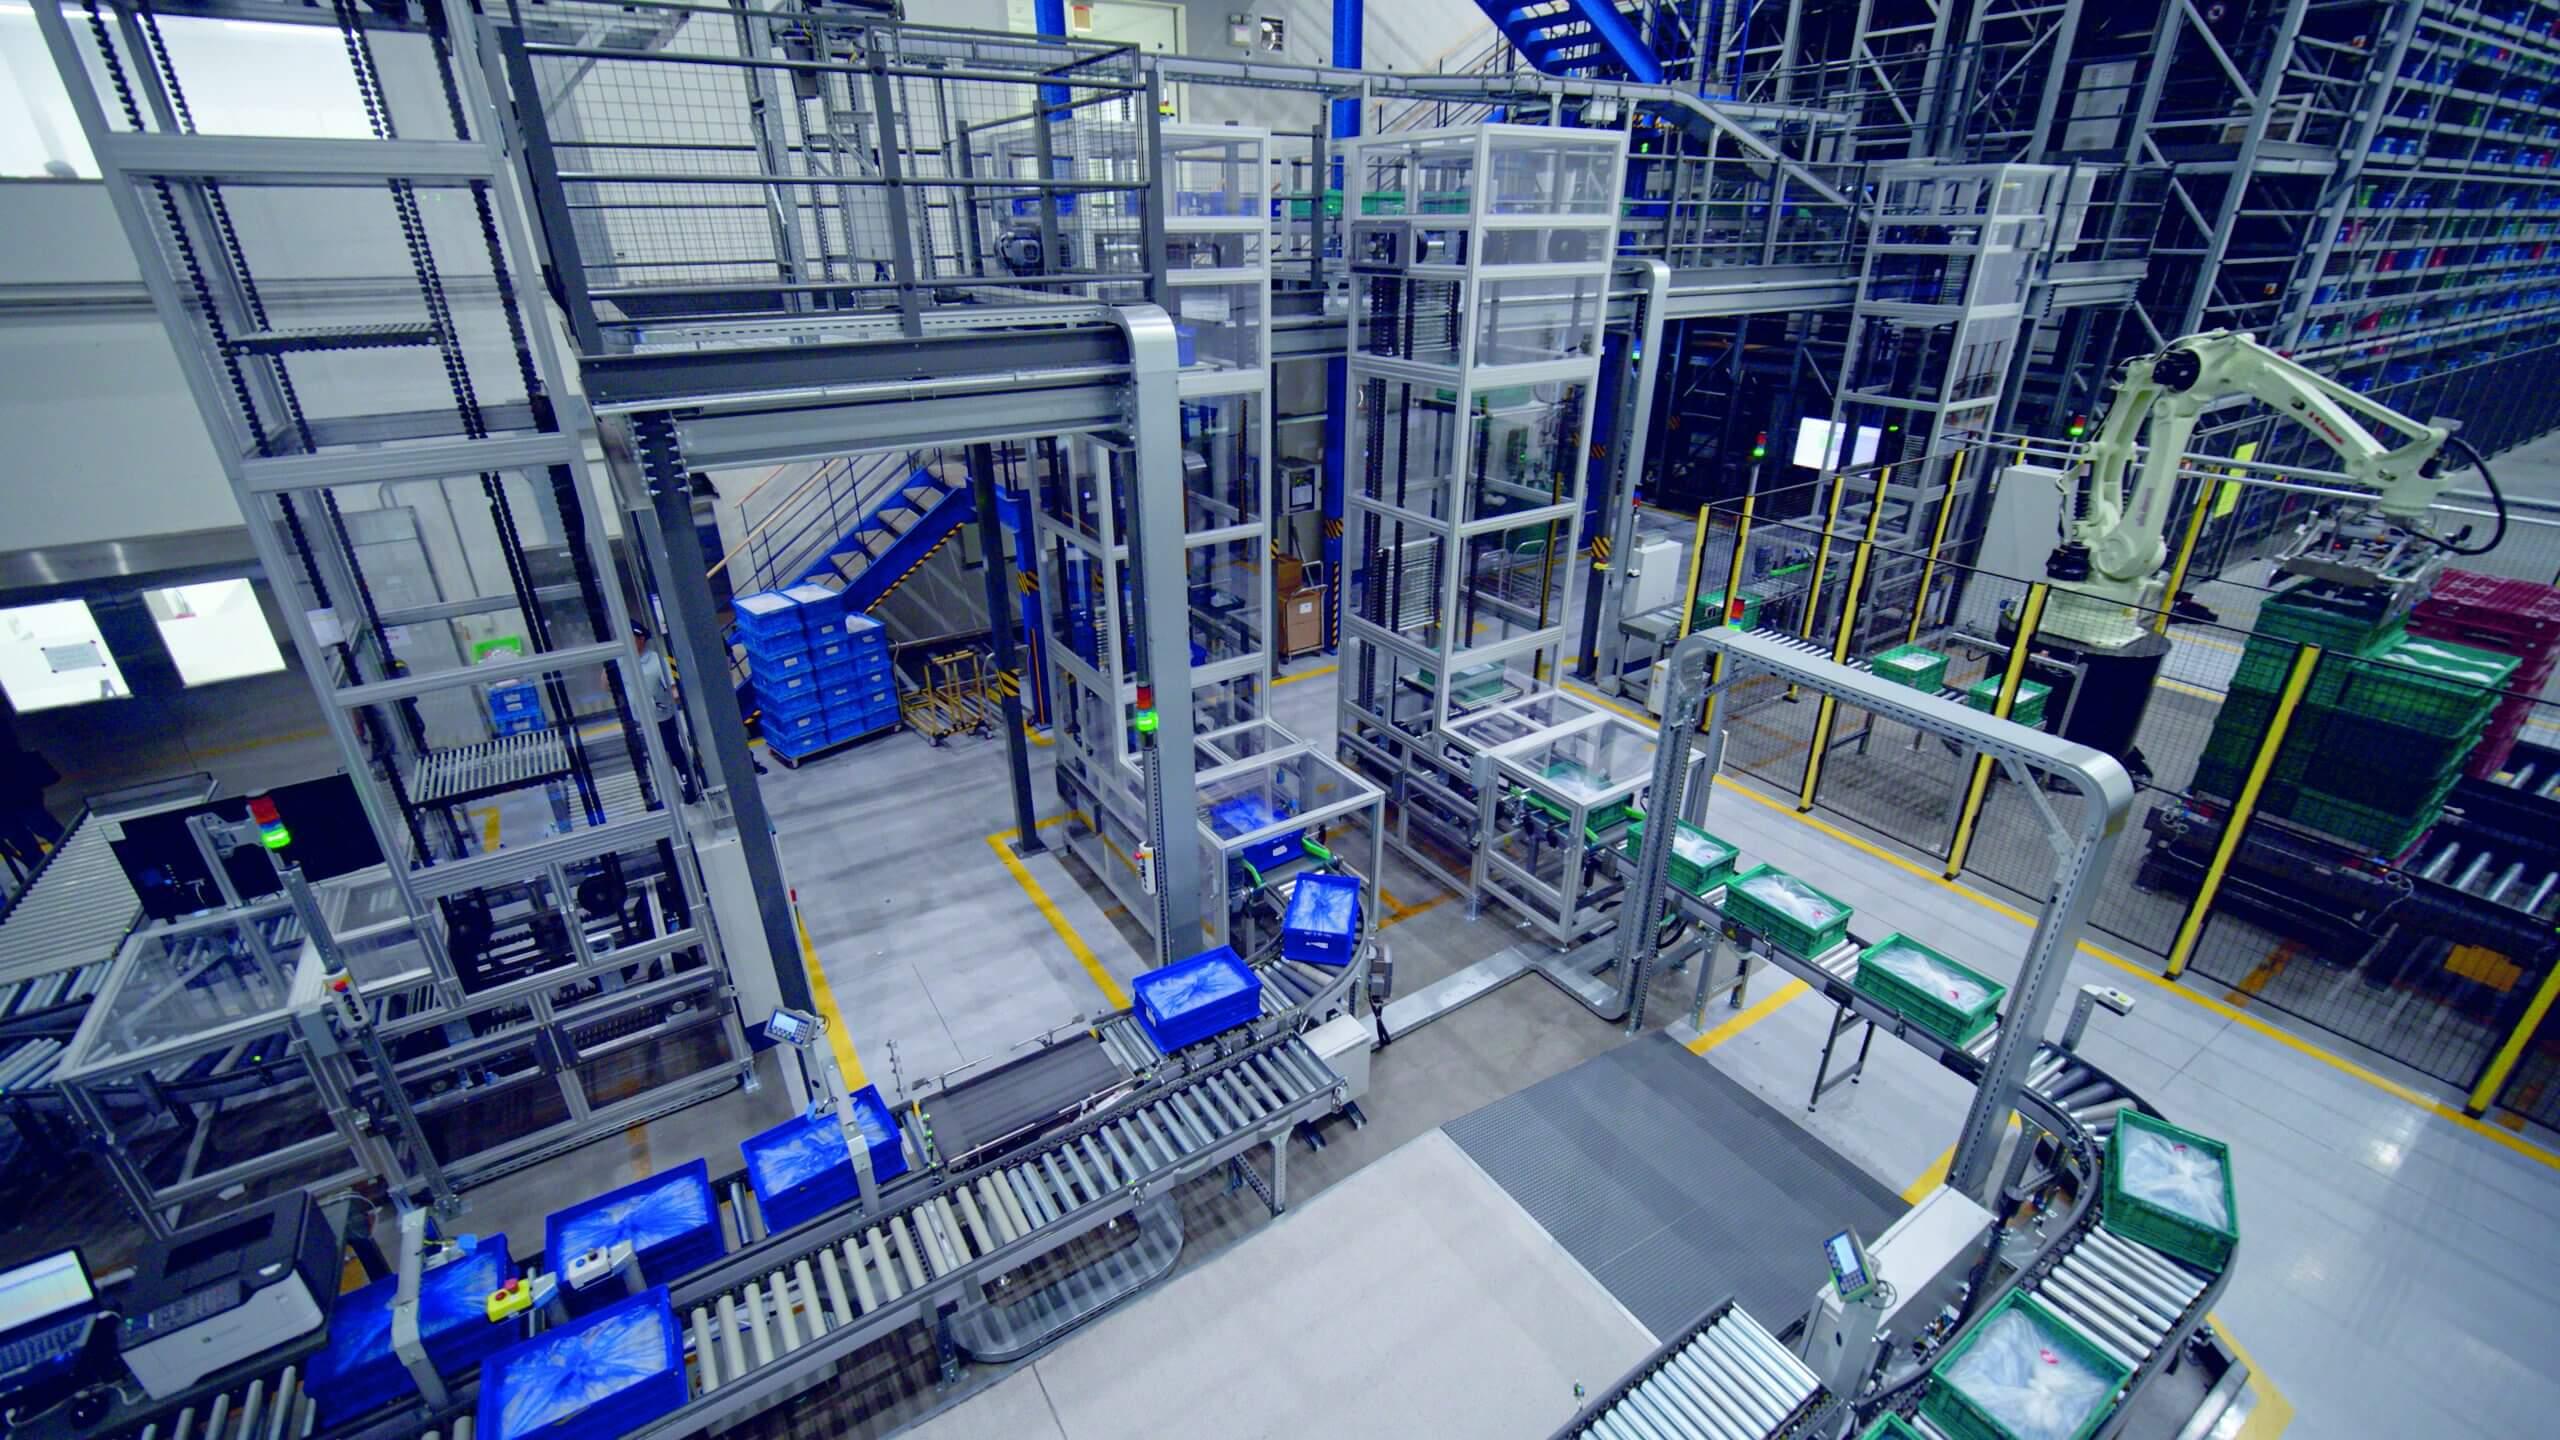 Wareneingang Amorepacific, Depalettierung, Roboter, Depalettierroboter, Automatisierung für Kosmetik, Produktion, Logistik, Intralogistik